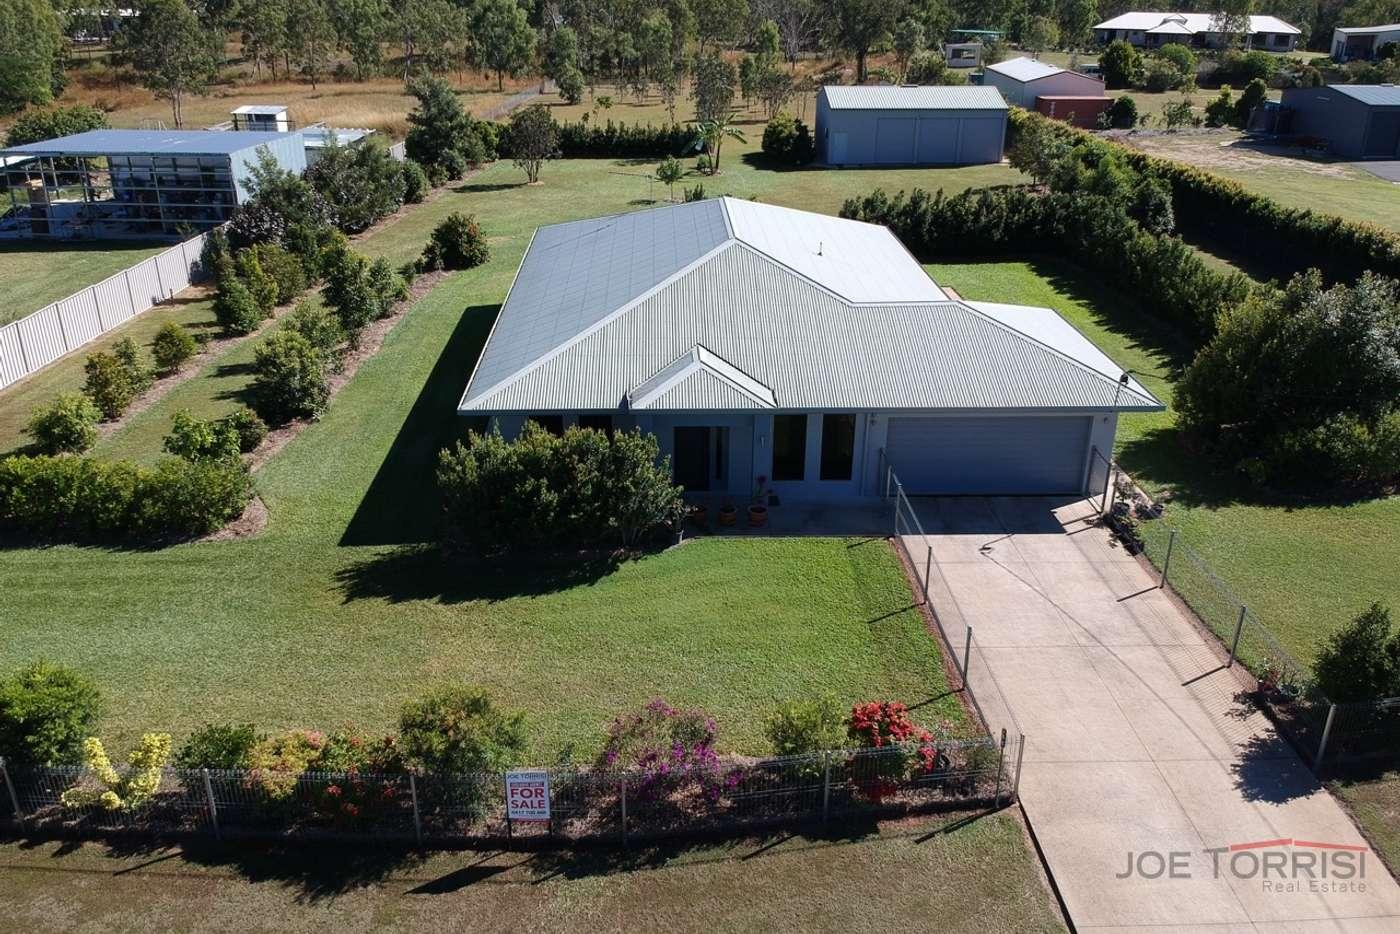 Main view of Homely house listing, 88 Hoolahan Drive, Mareeba QLD 4880